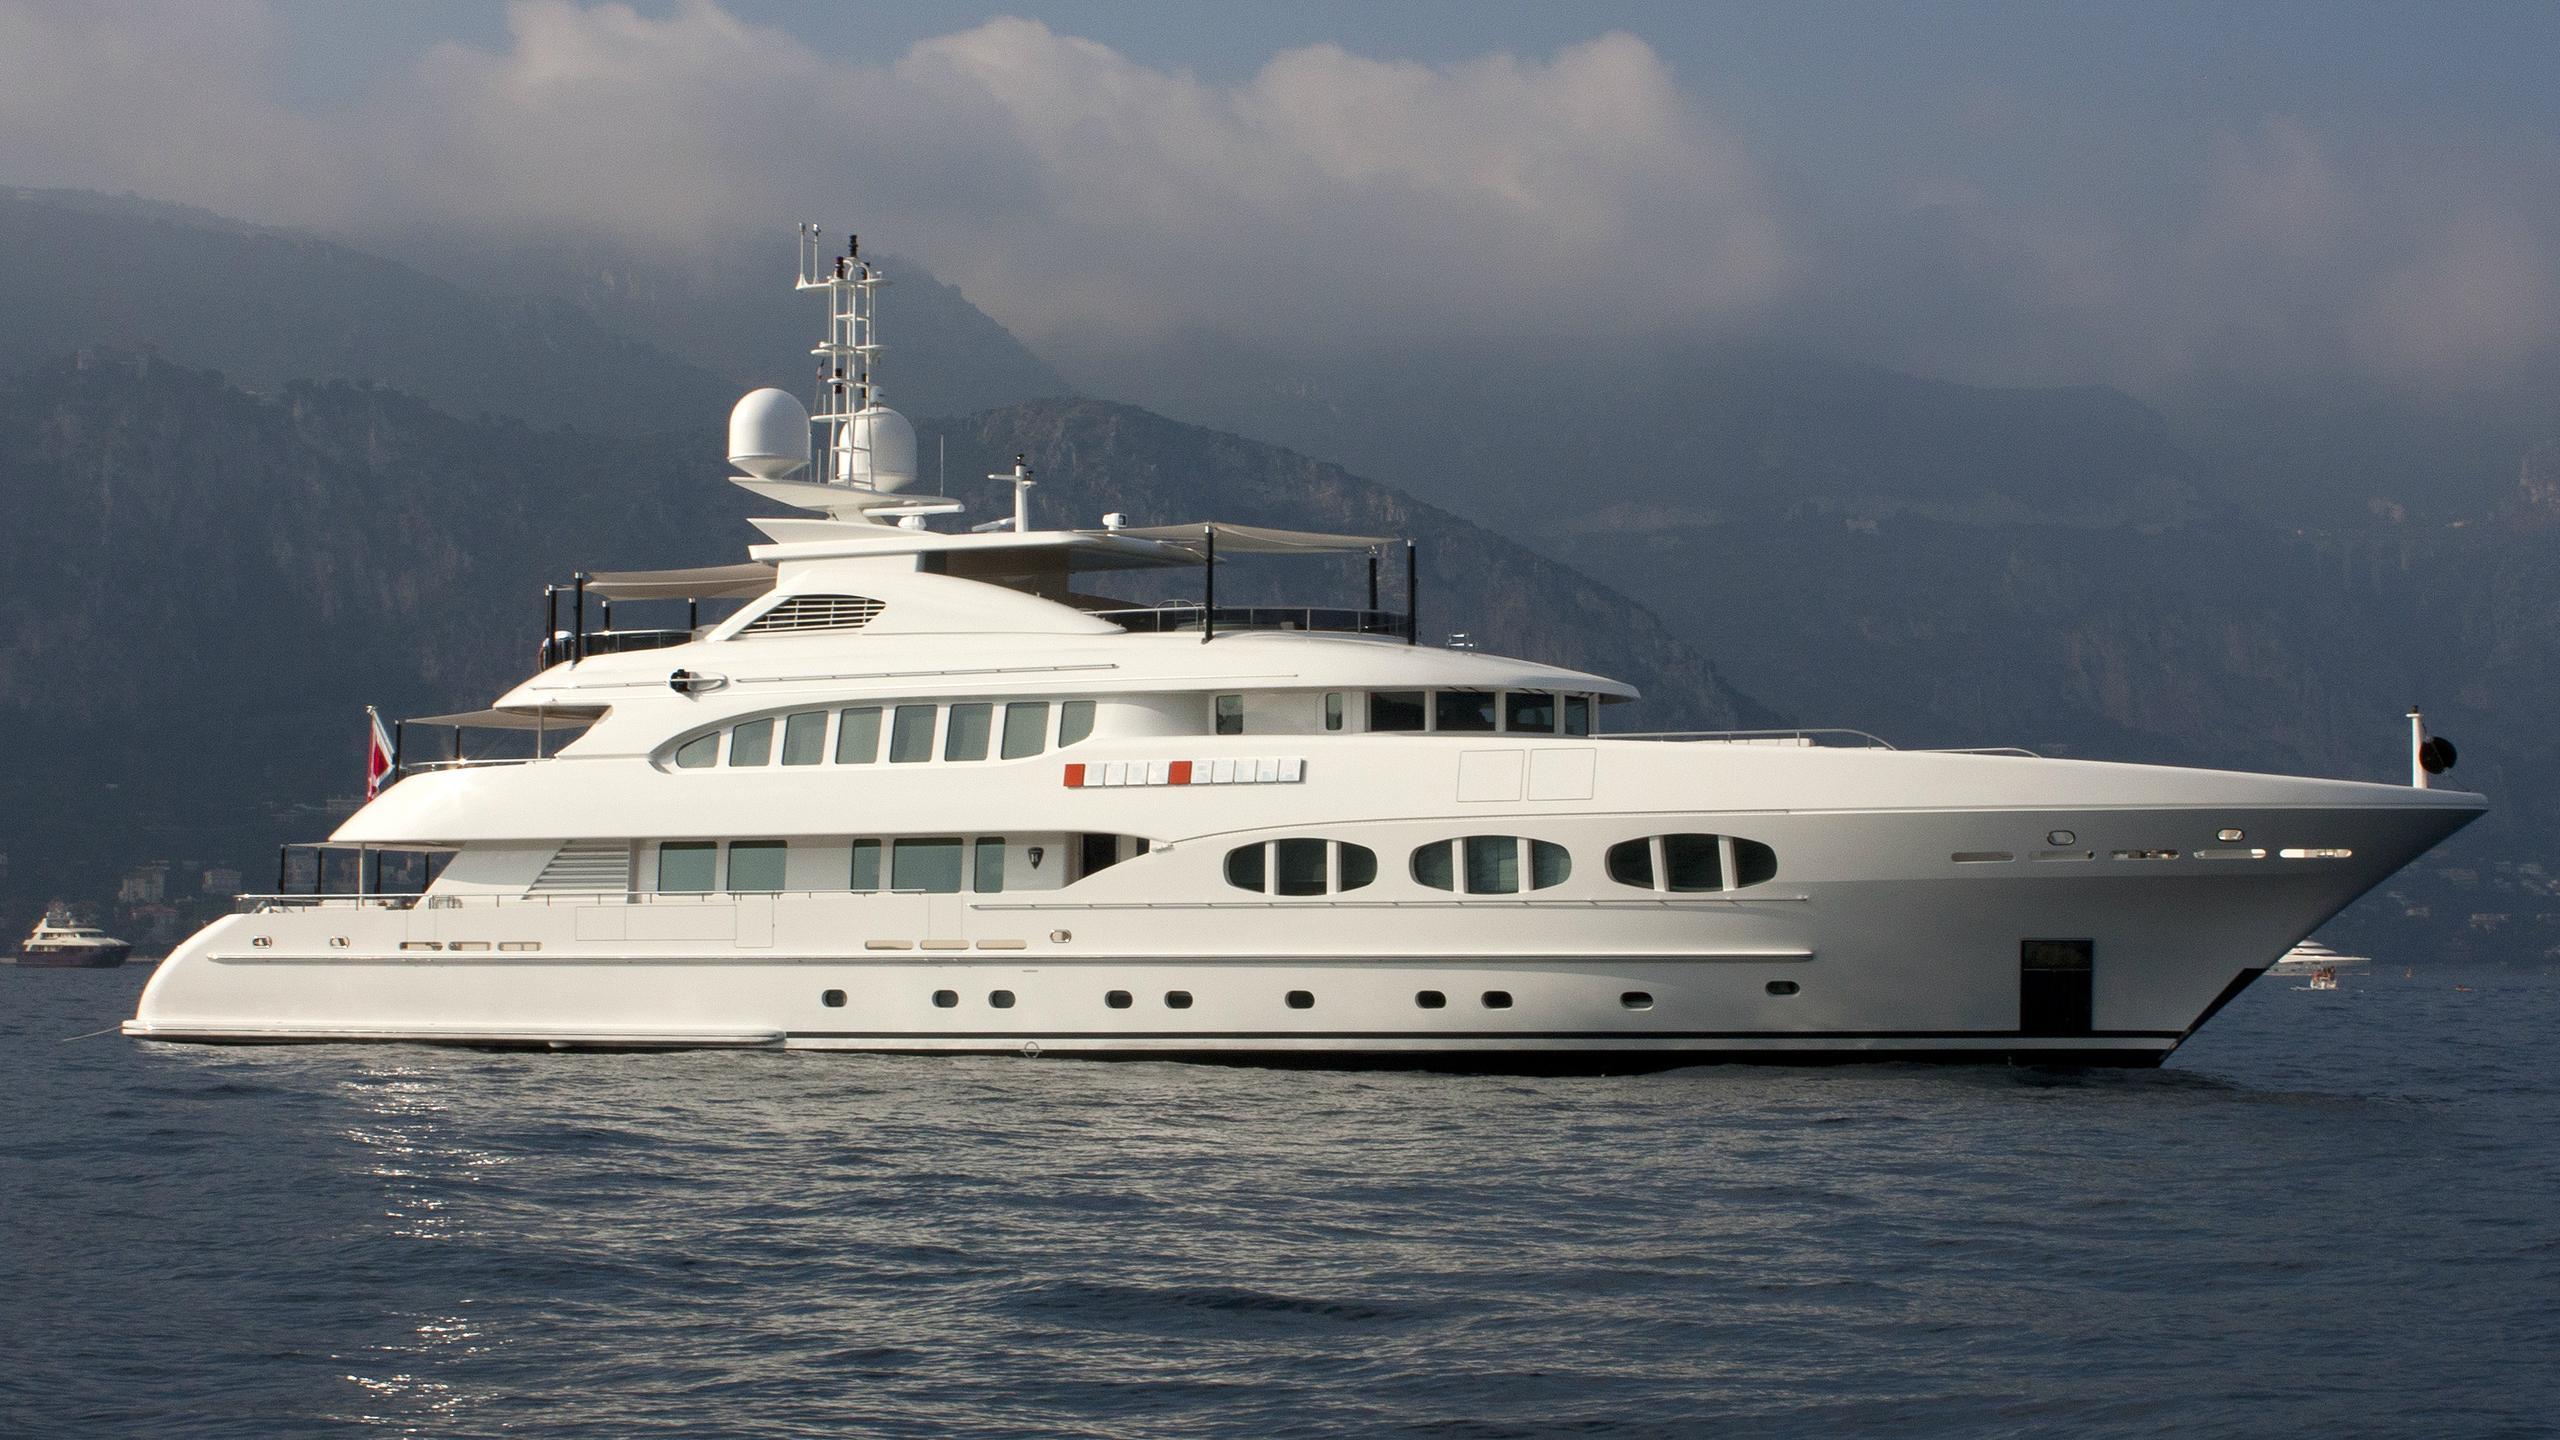 odyssea-como-lady-petra-motor-yacht-heesen-2012-47m-profile